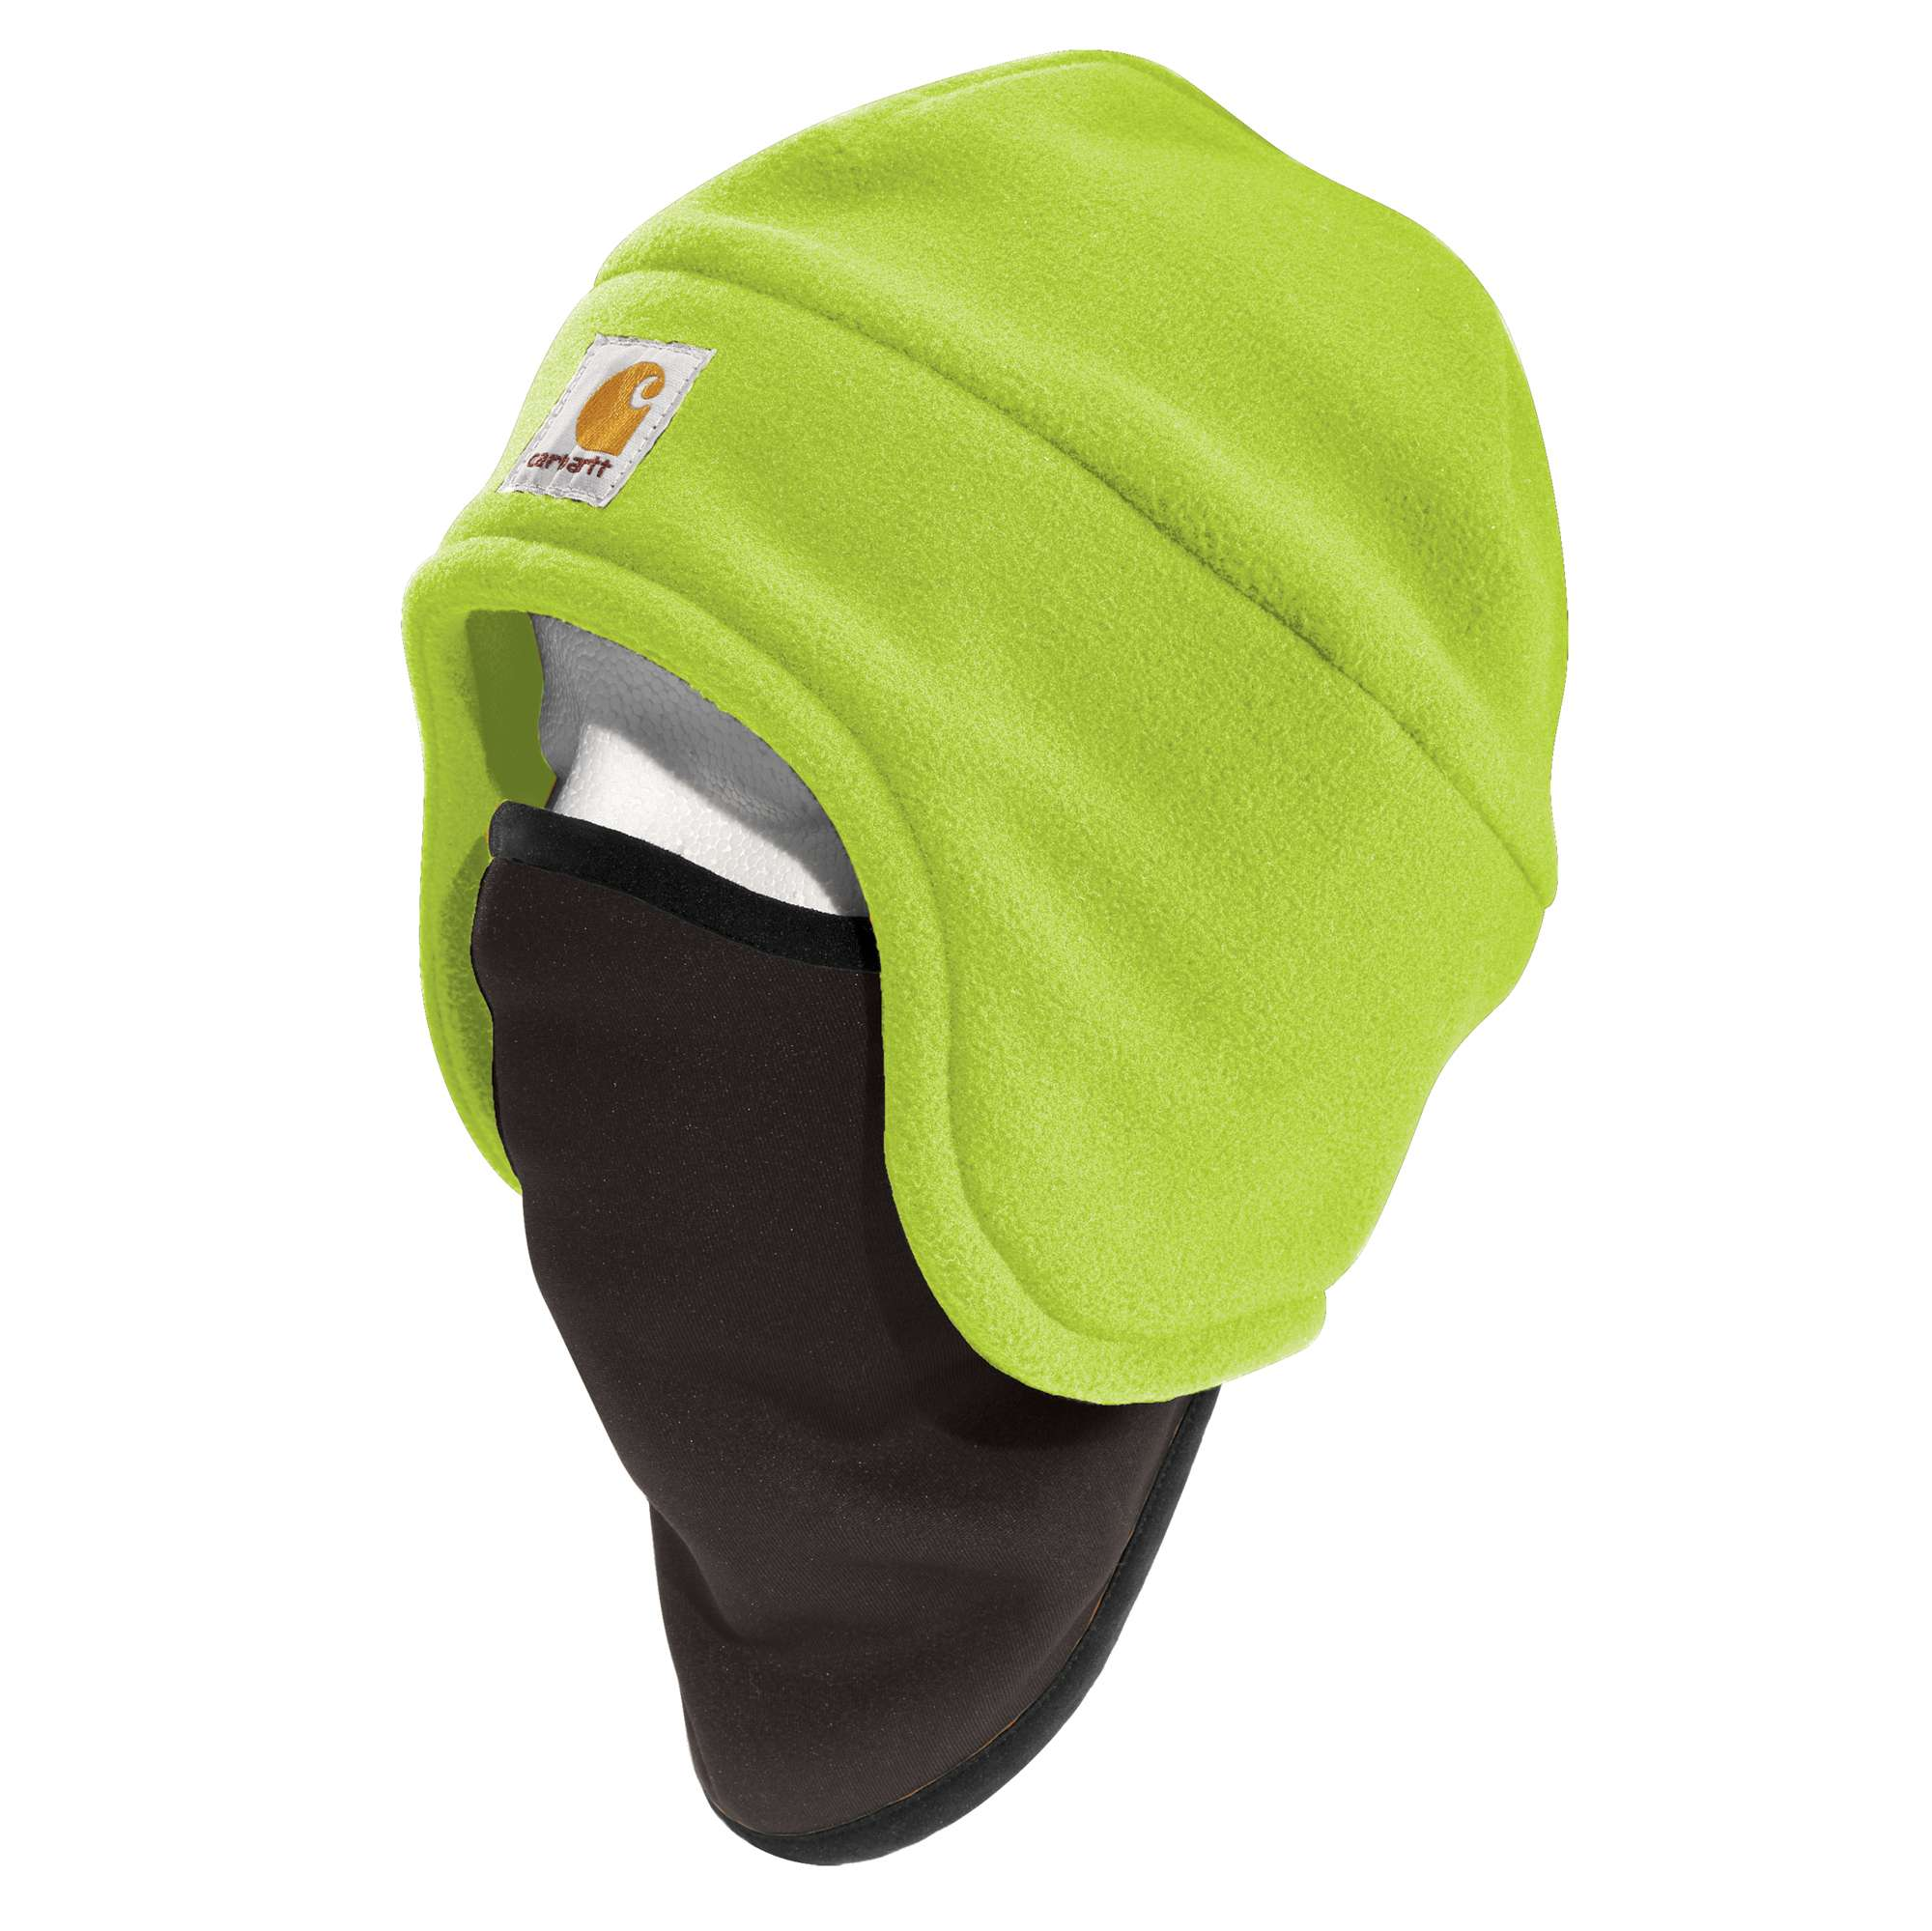 Carhartt High-Visibility Color Enhanced Fleece 2-in-1 Hat